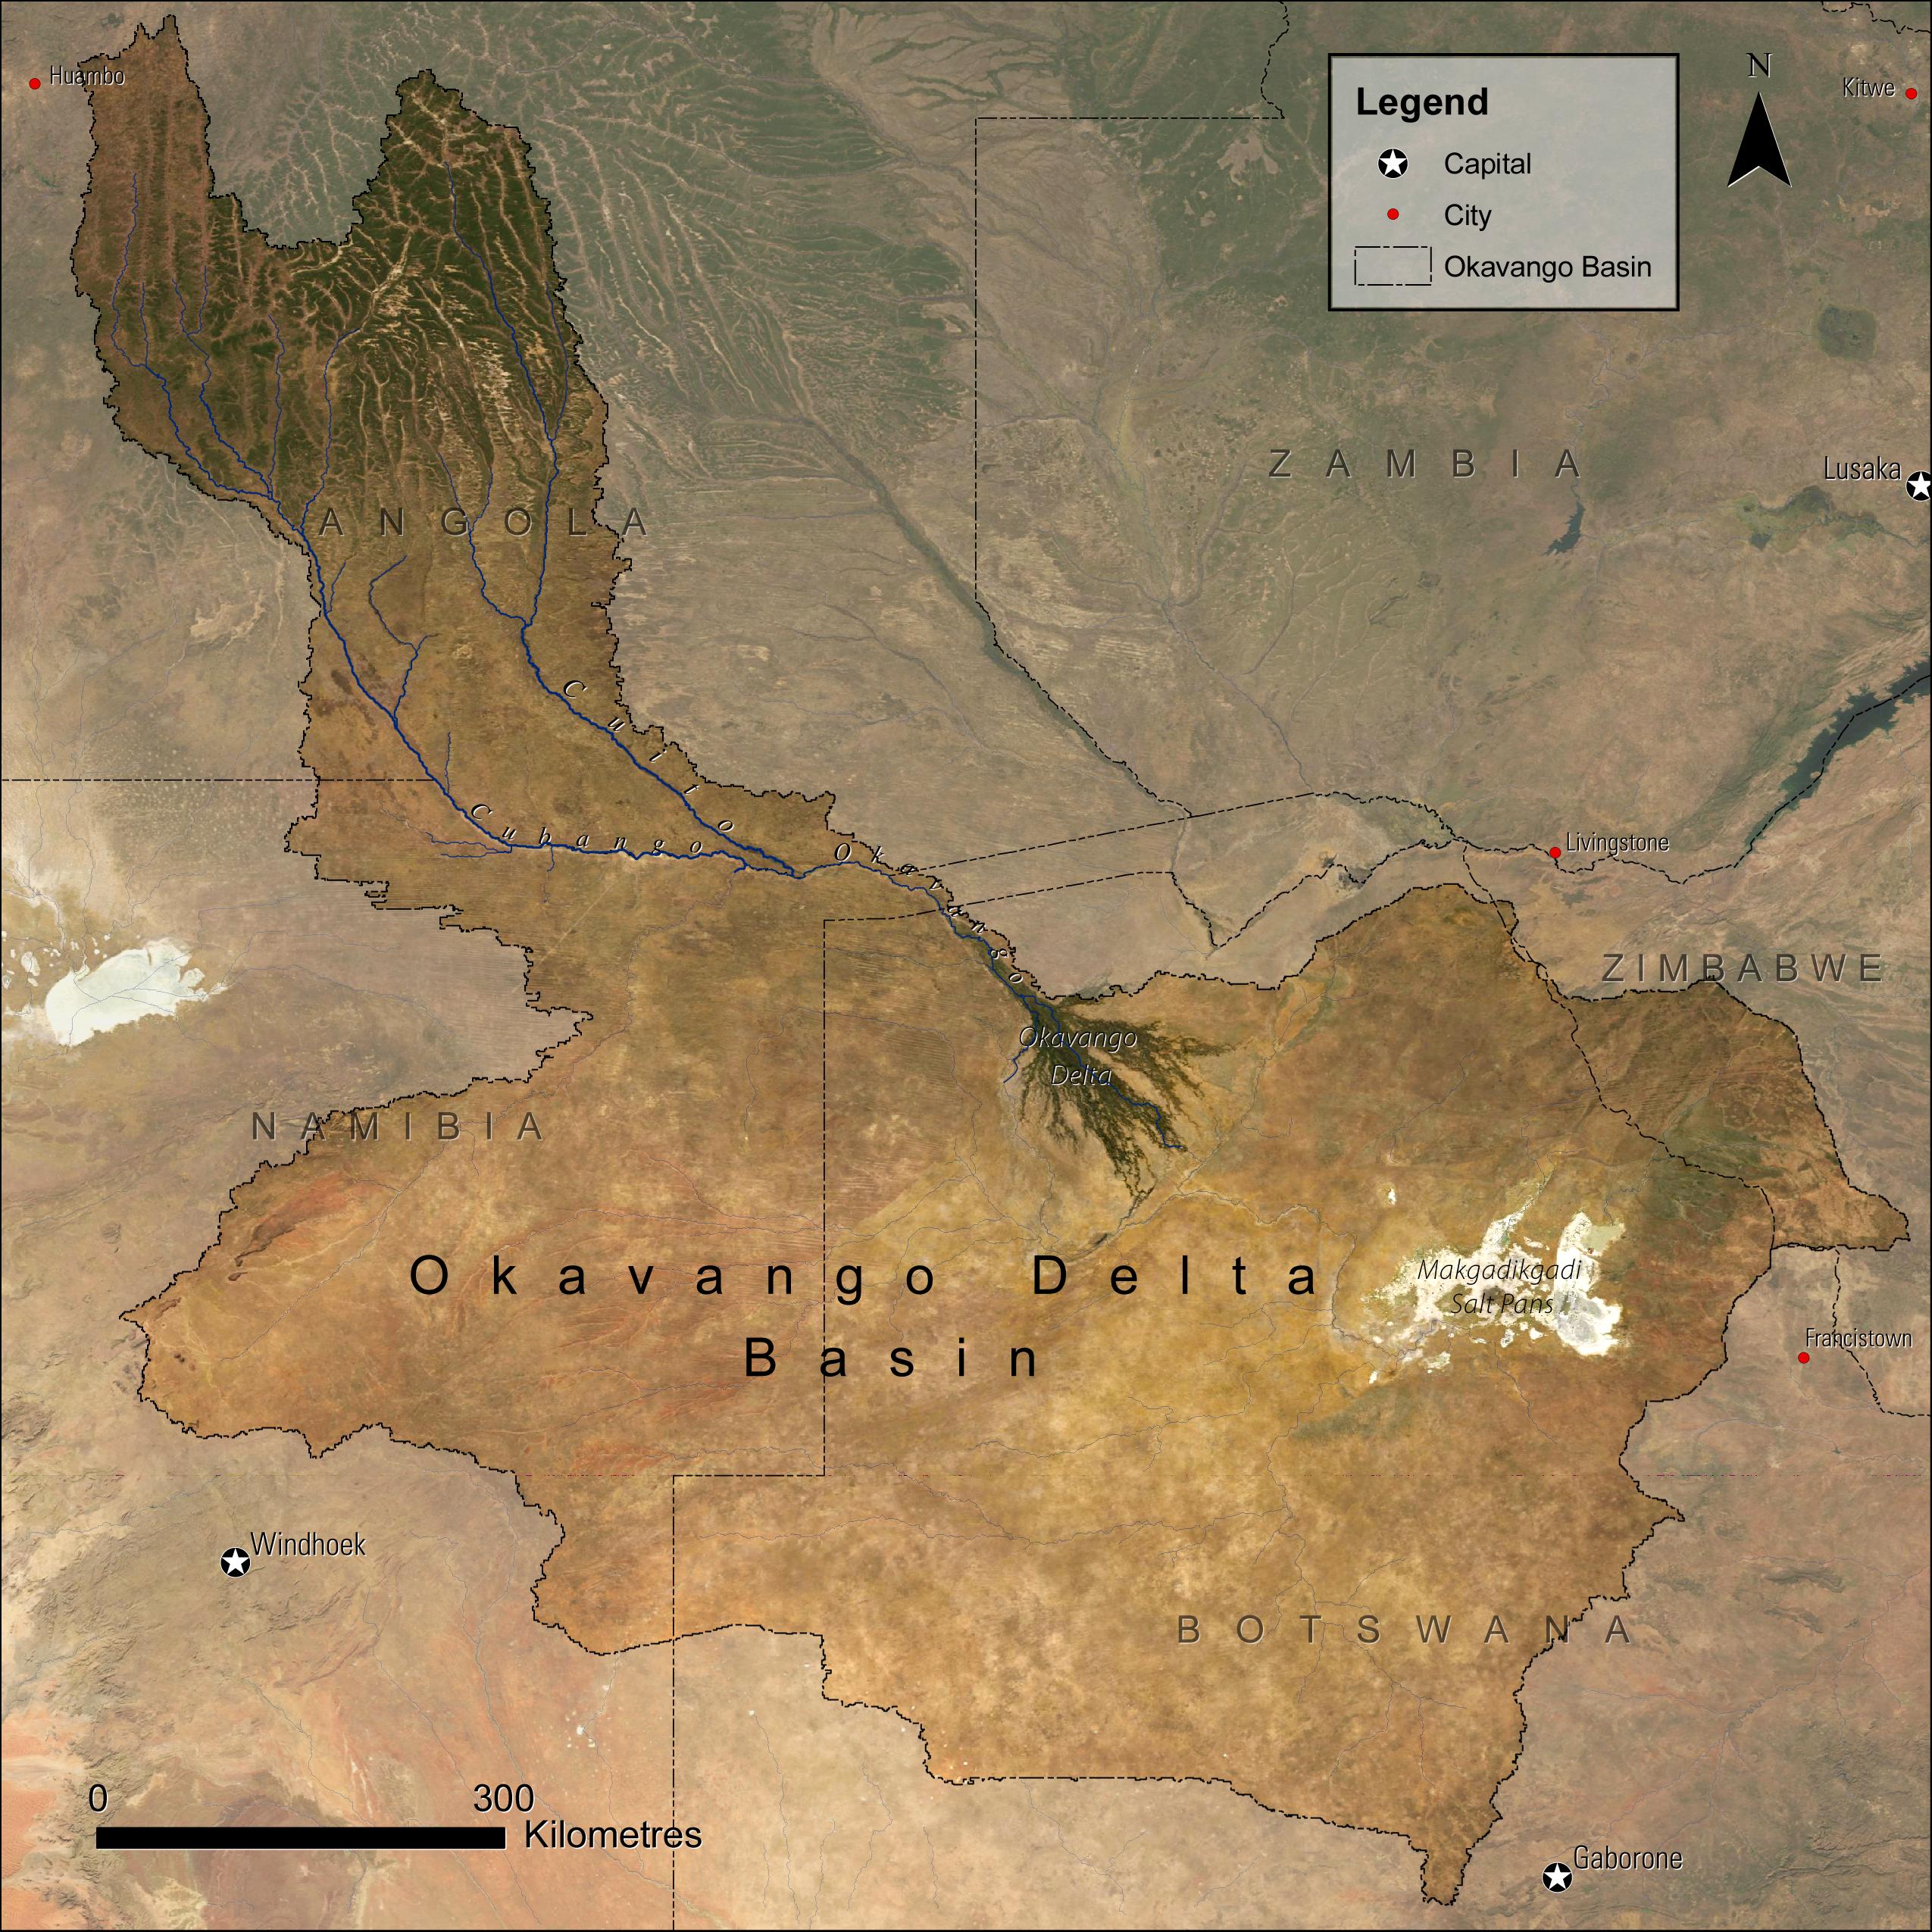 UNEP/GRID-Sioux Falls Okavango Basin Map